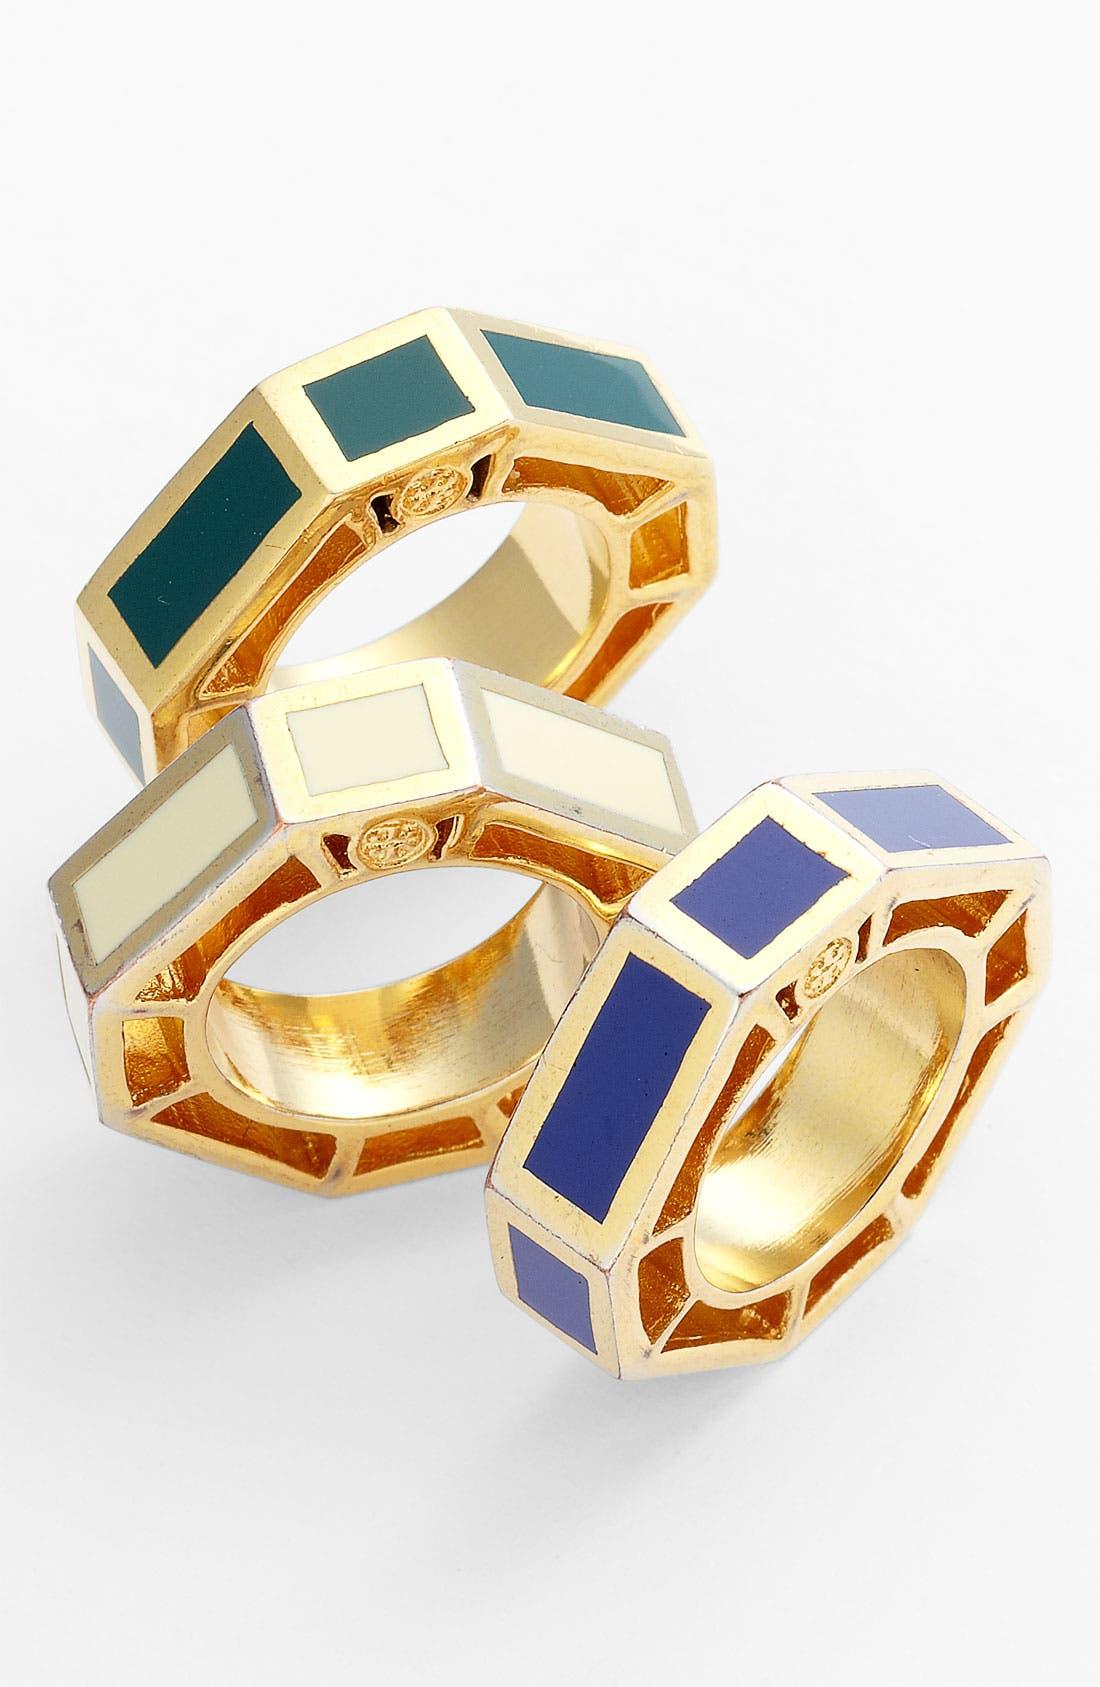 Main Image - Tory Burch 'Rylan' Ring